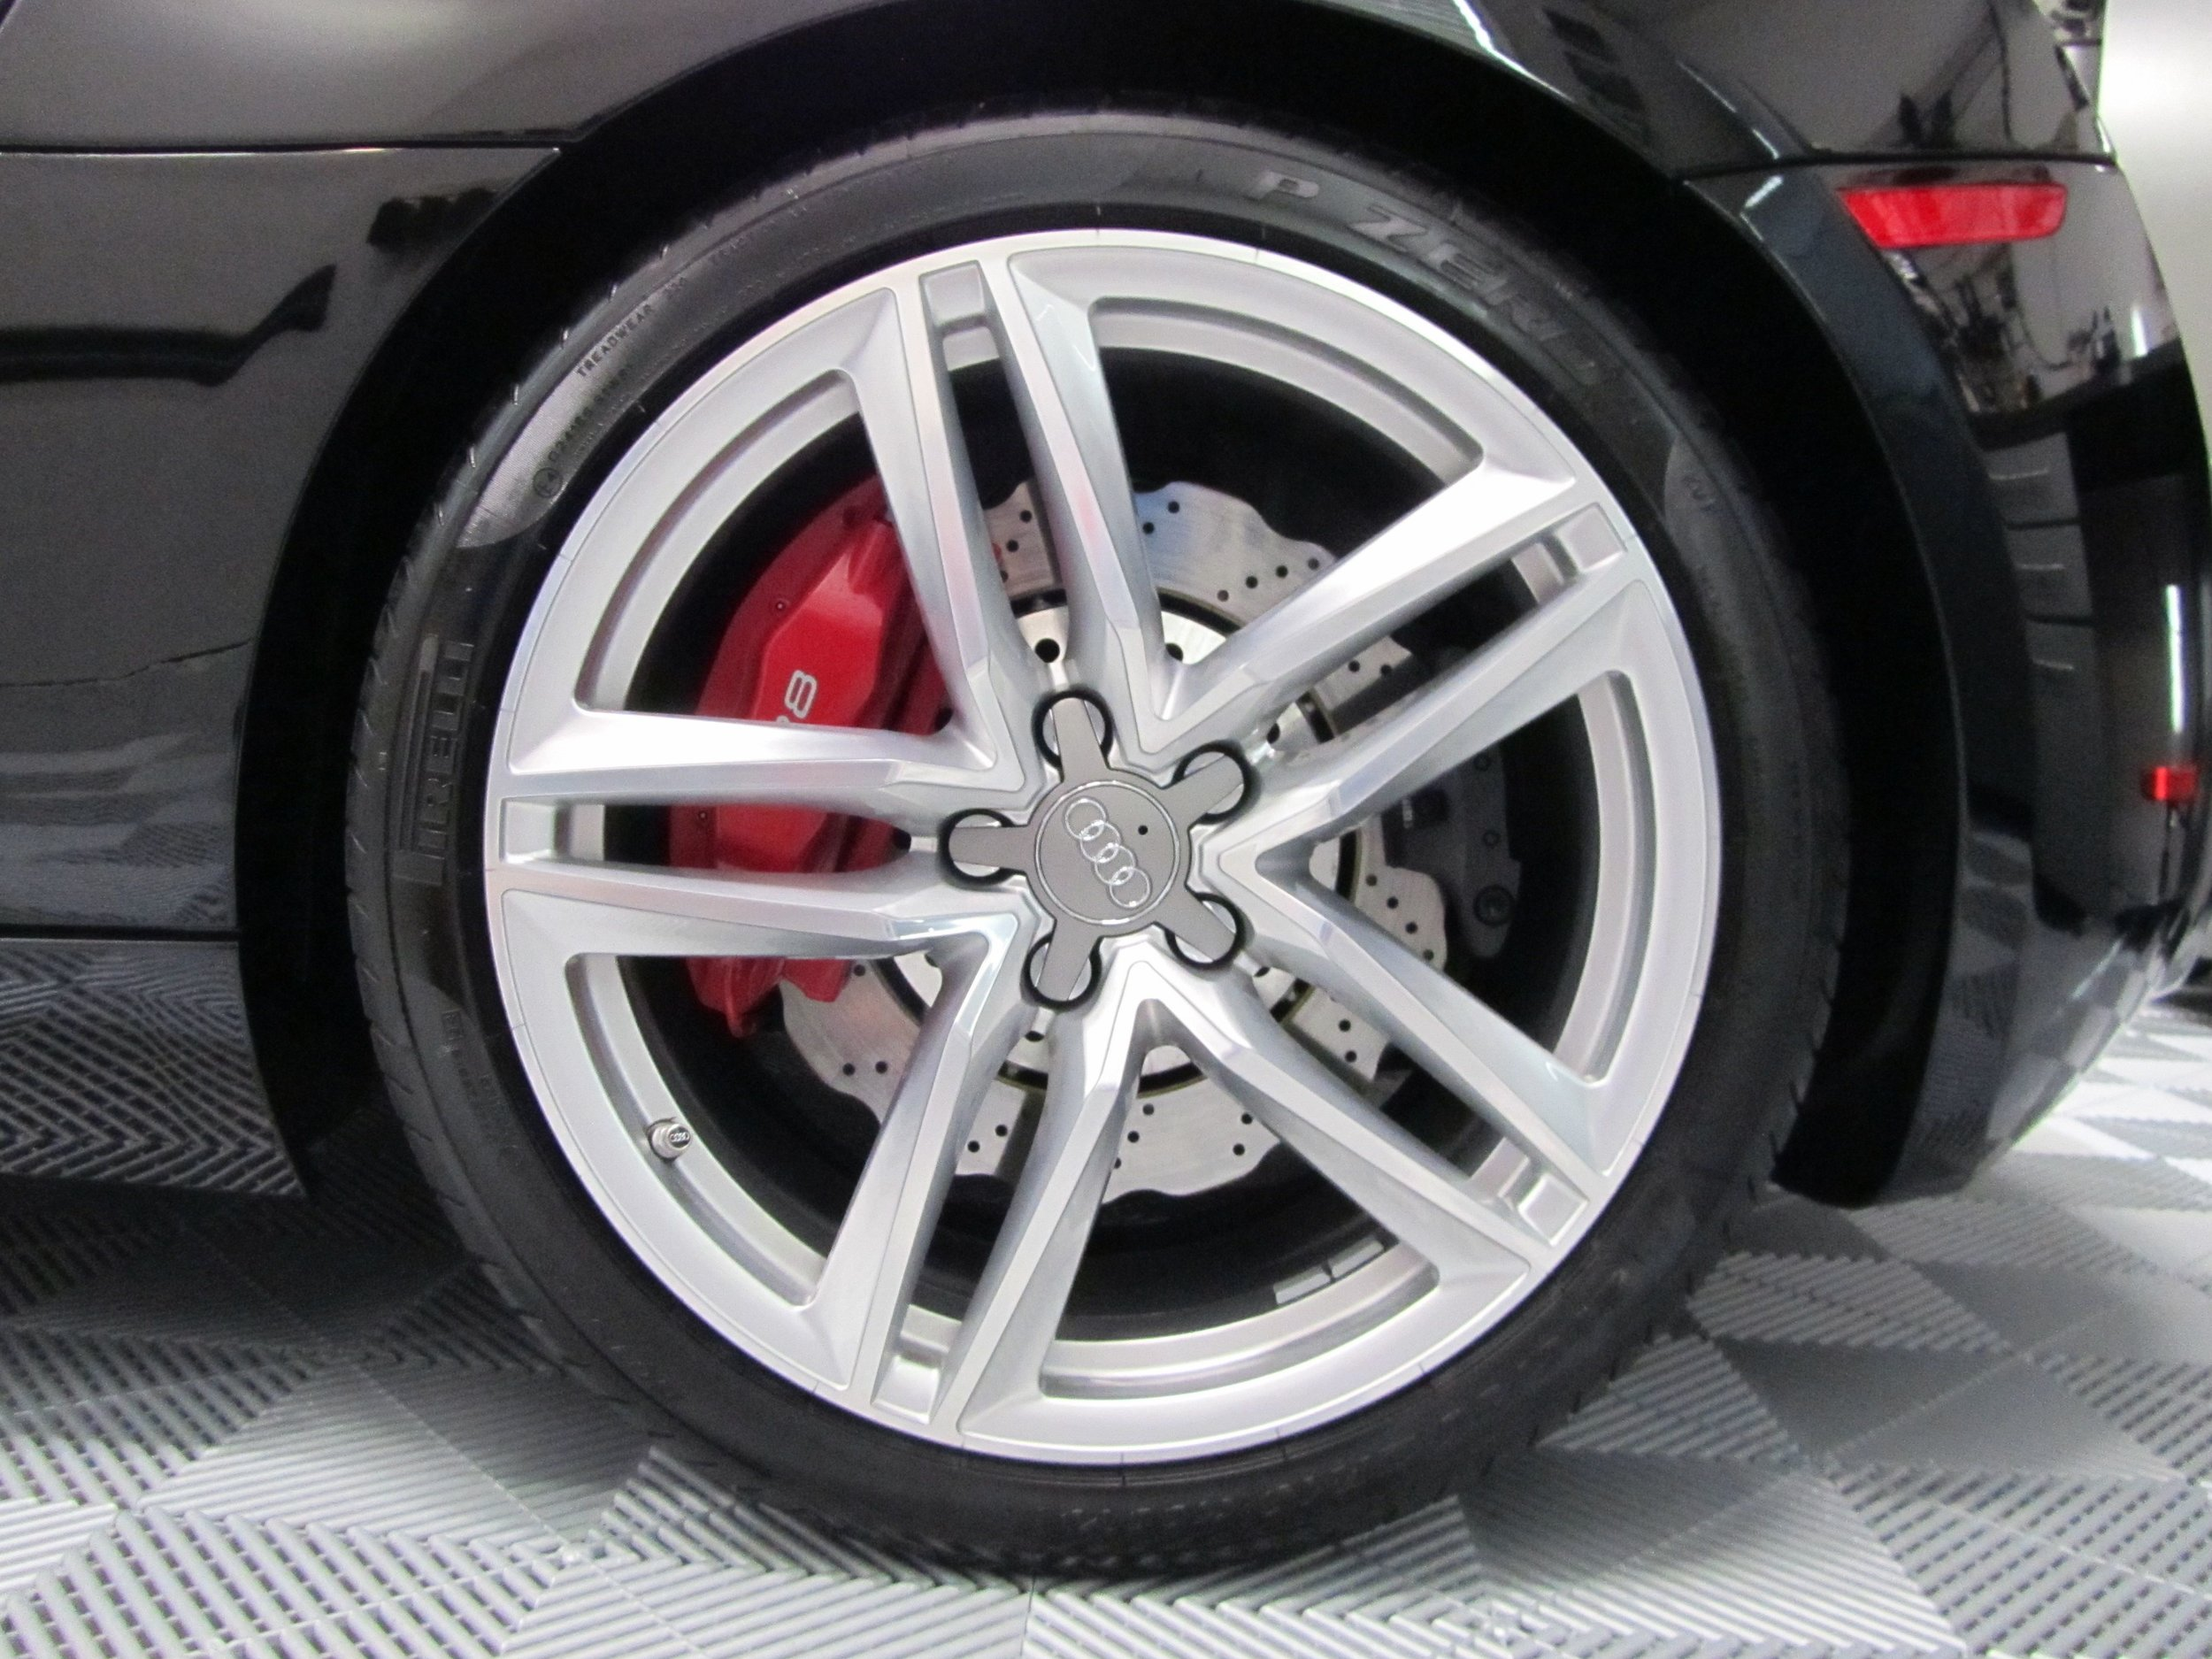 04 - 2015 Audi R8 Wheel.jpg